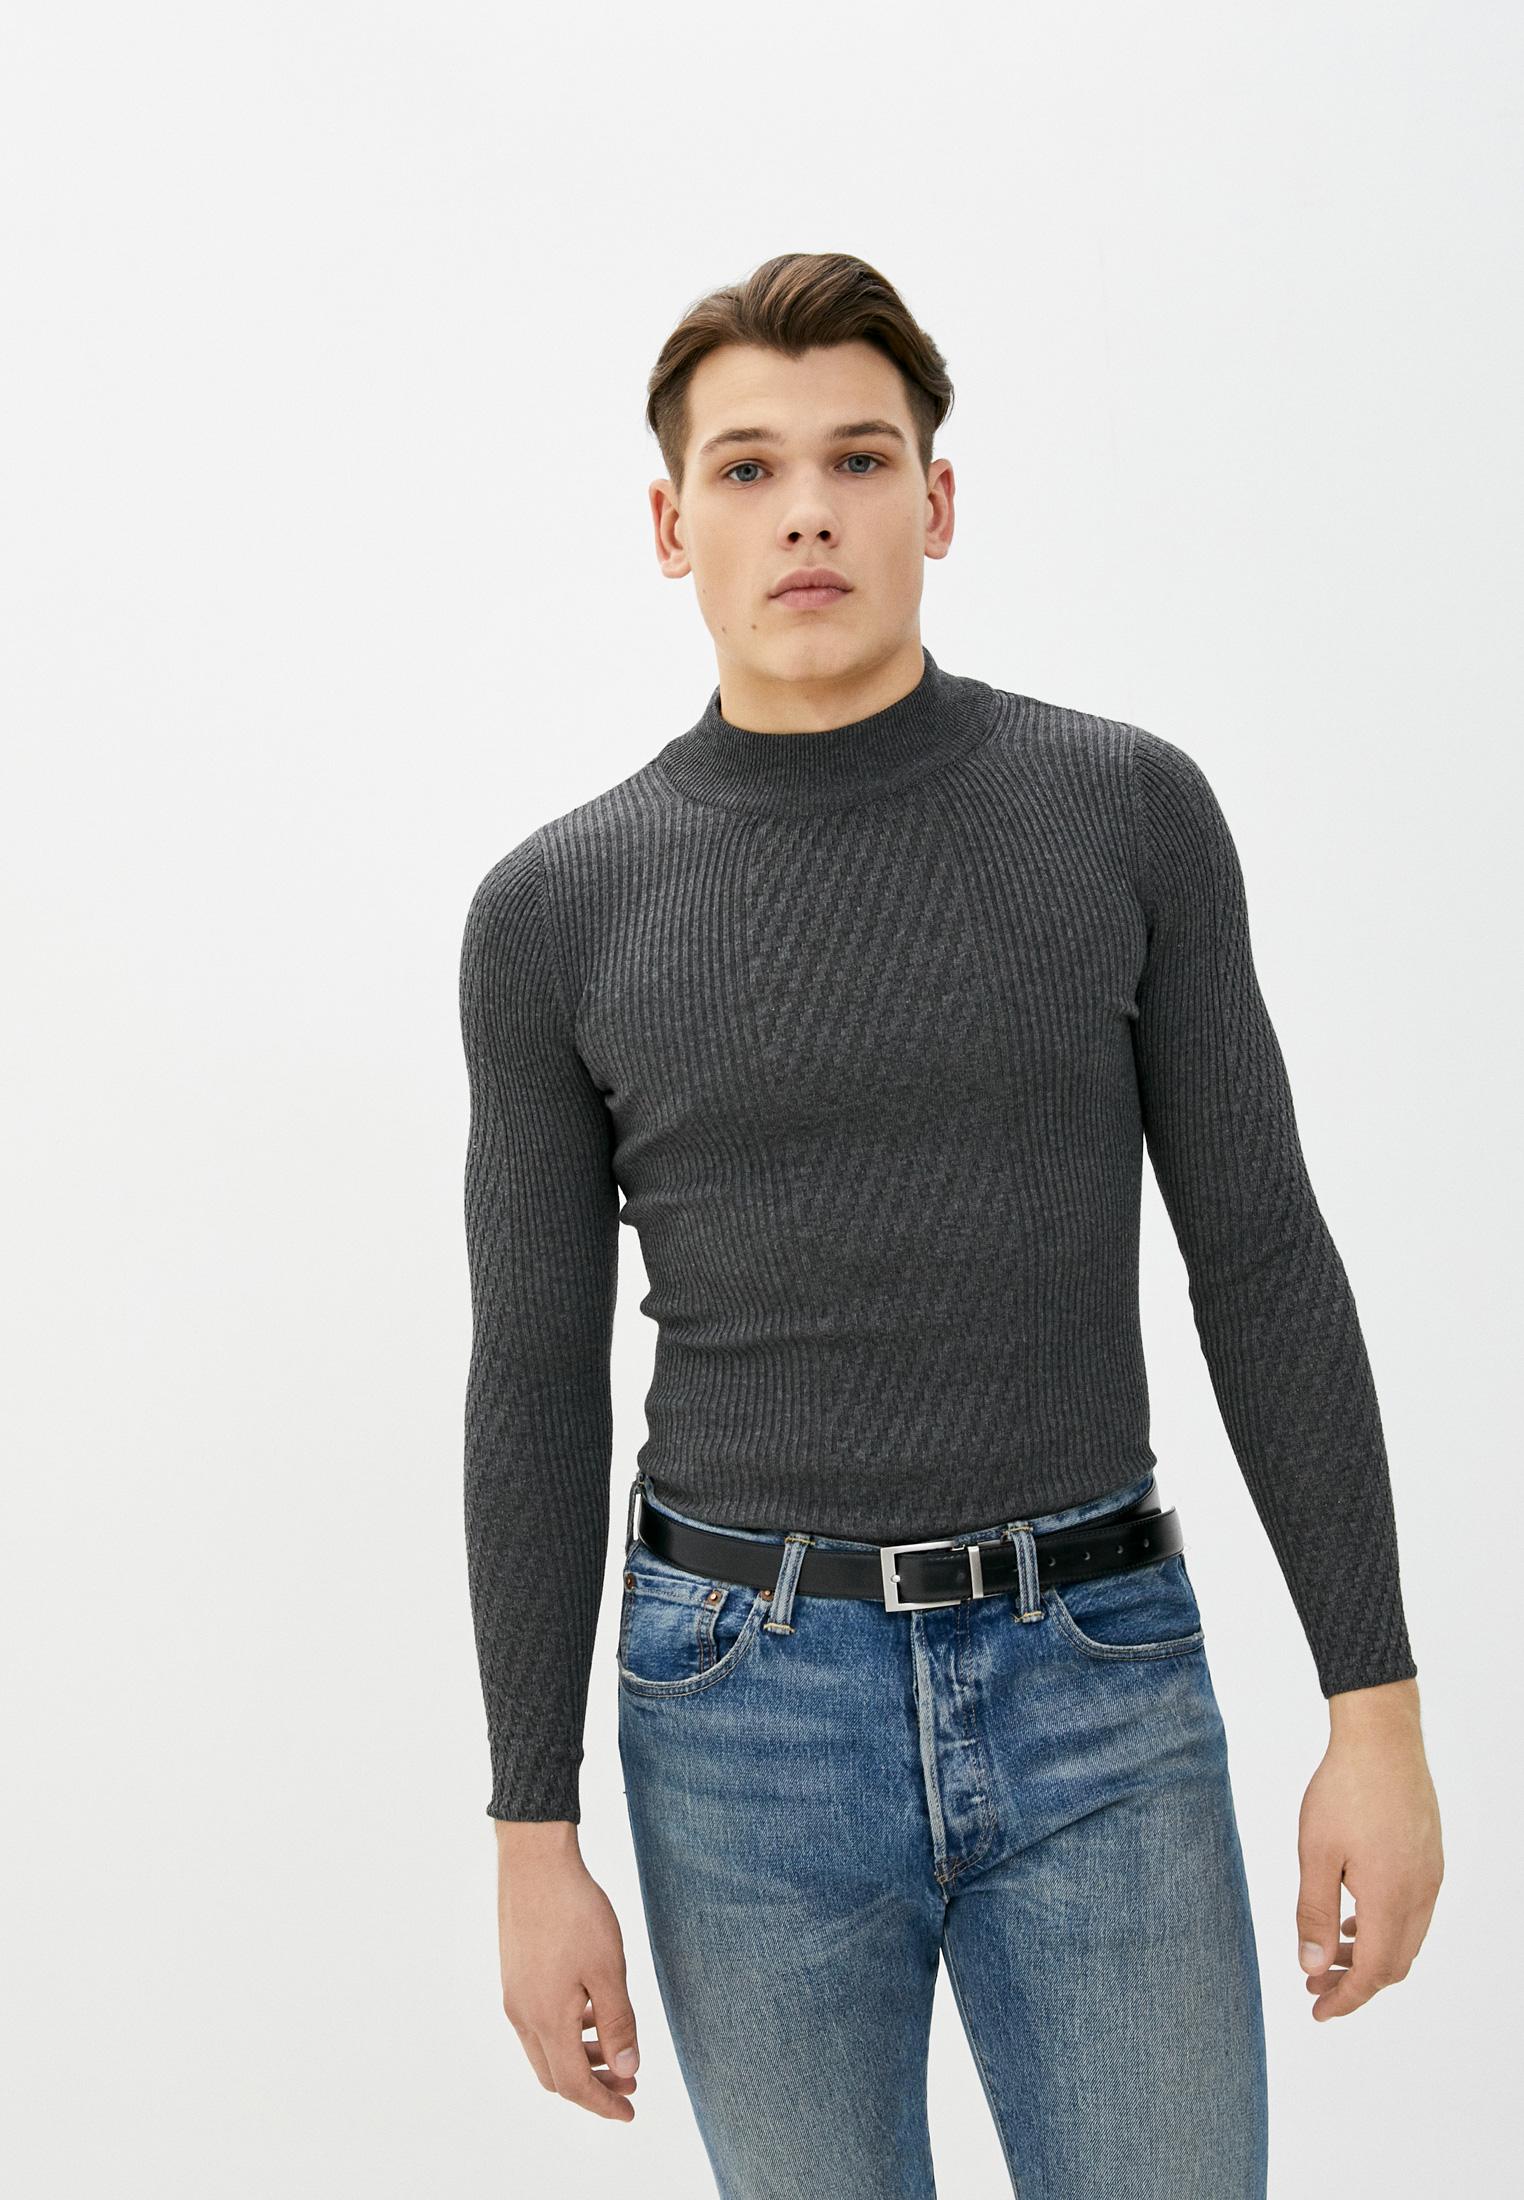 Мужская одежда Dali 2494